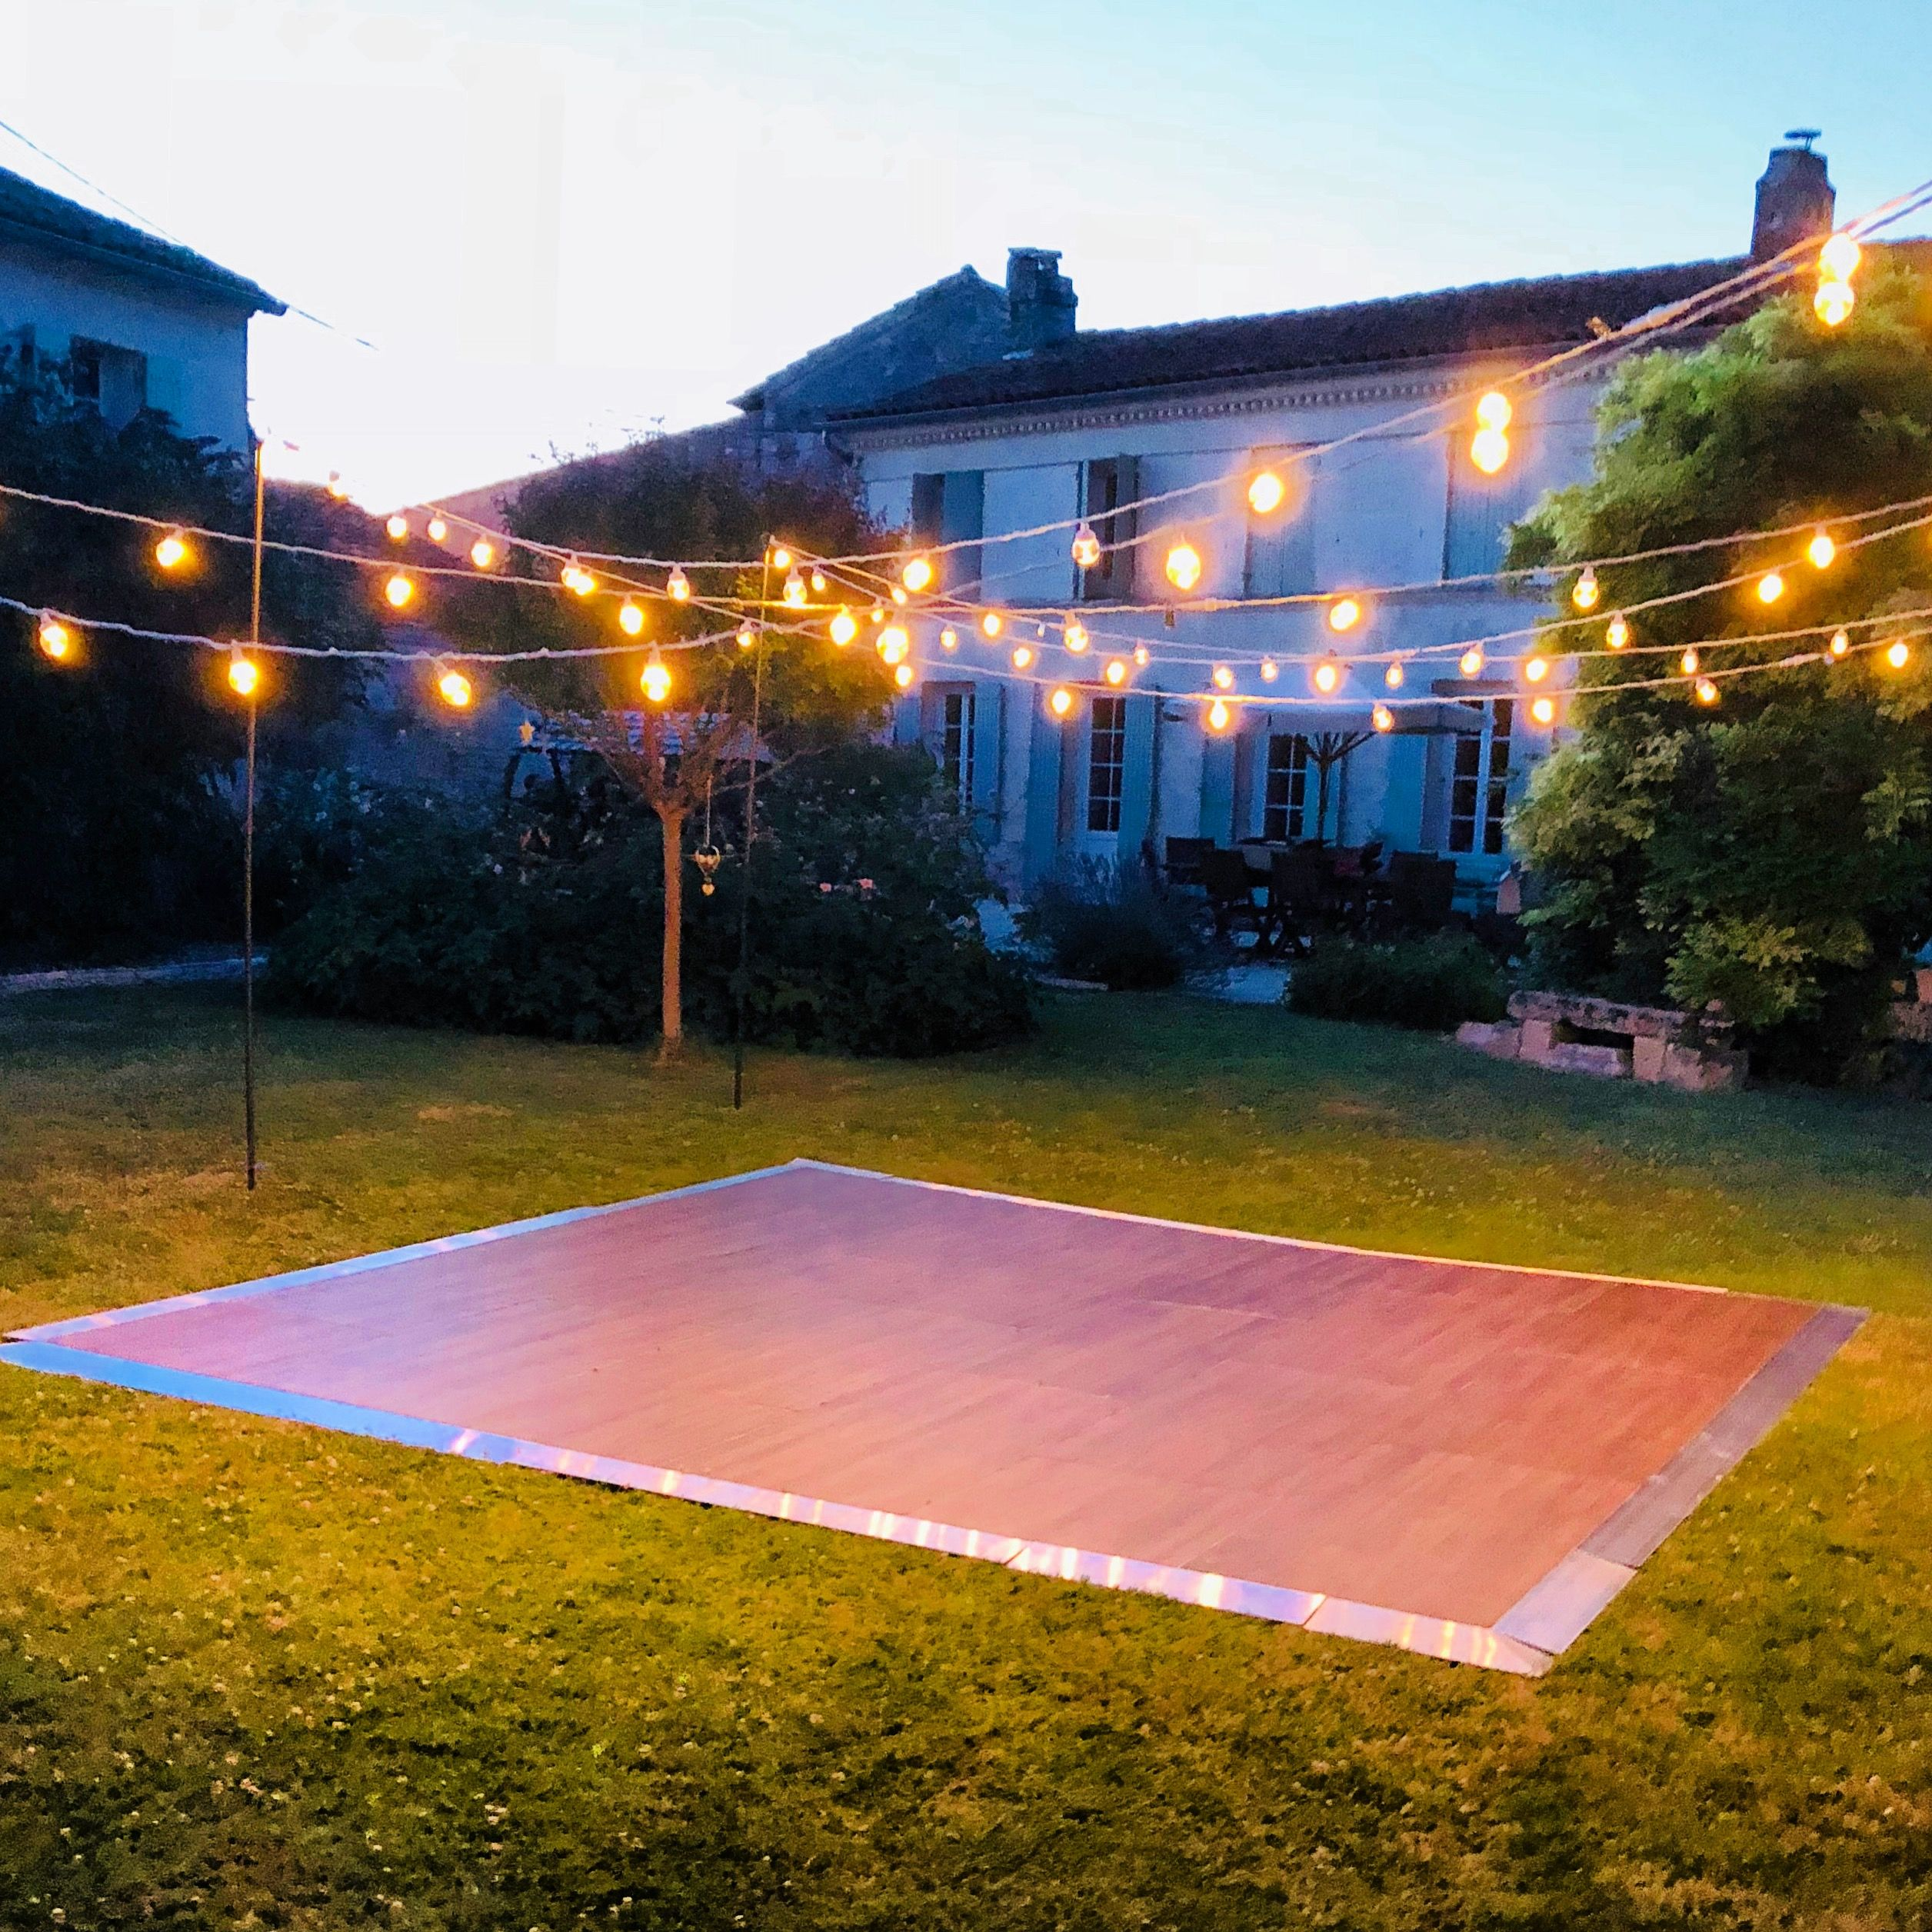 Pin By Syeda Arfa On Zuha S Wedding Outdoor Dance Floors Outdoor Dance Floor